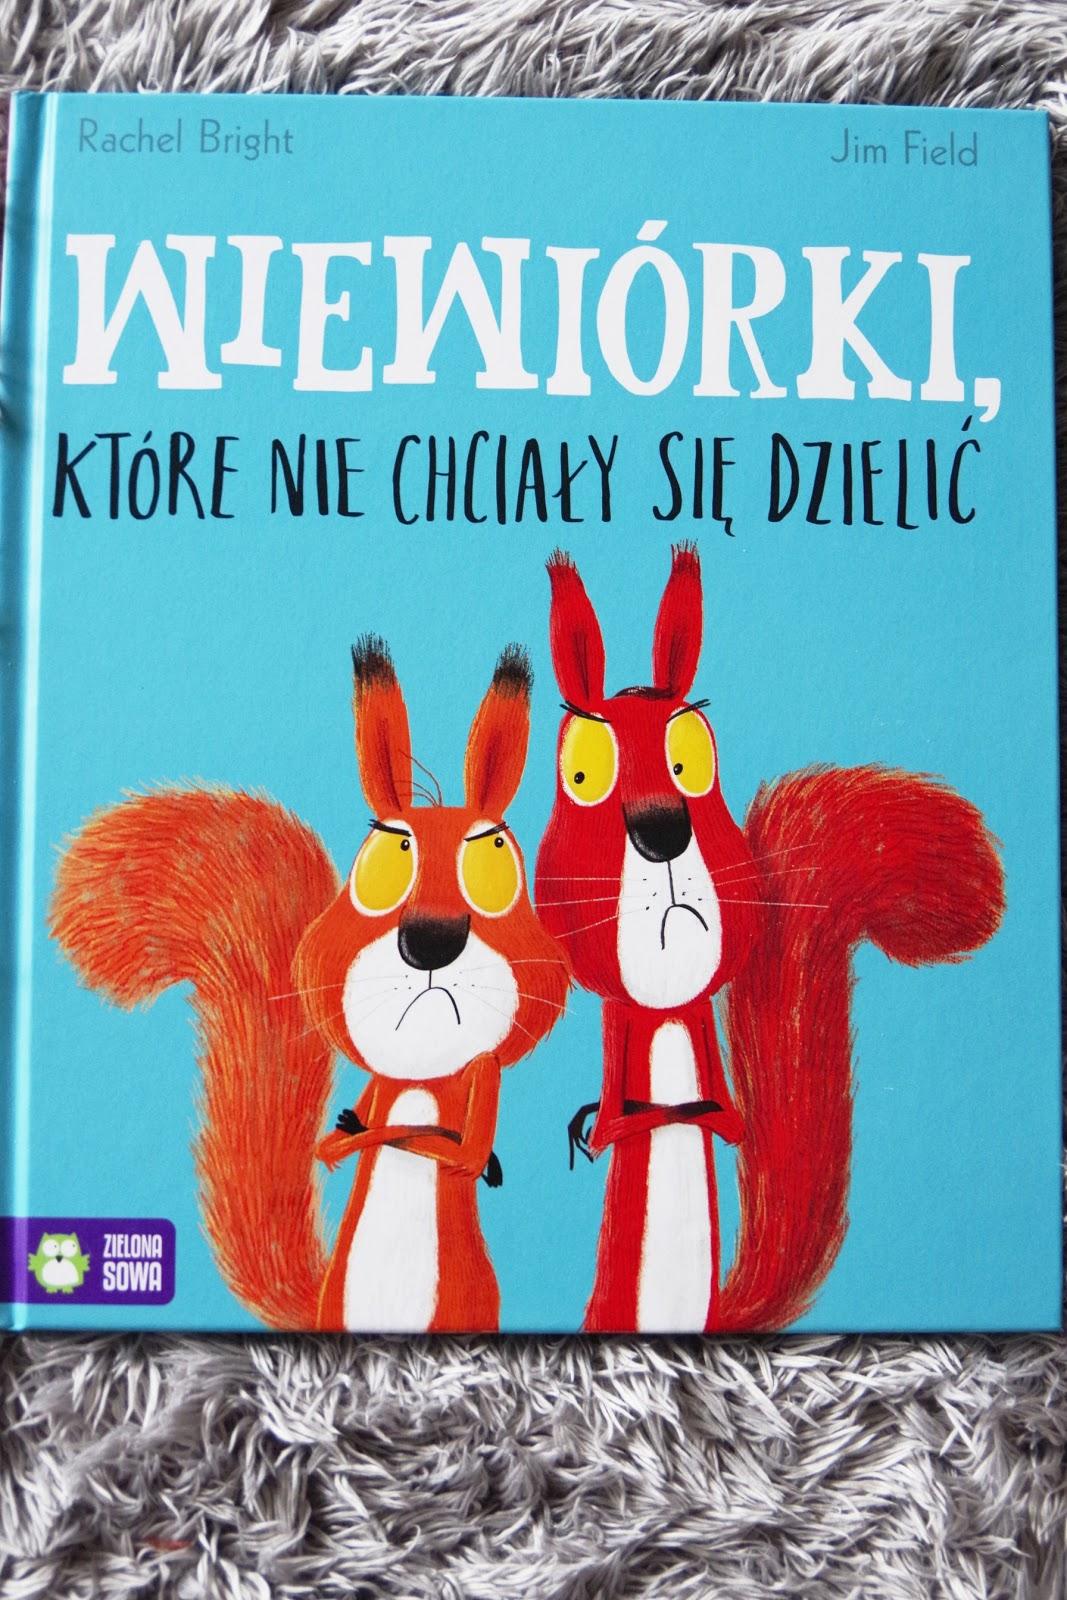 Picture book dla dzieci